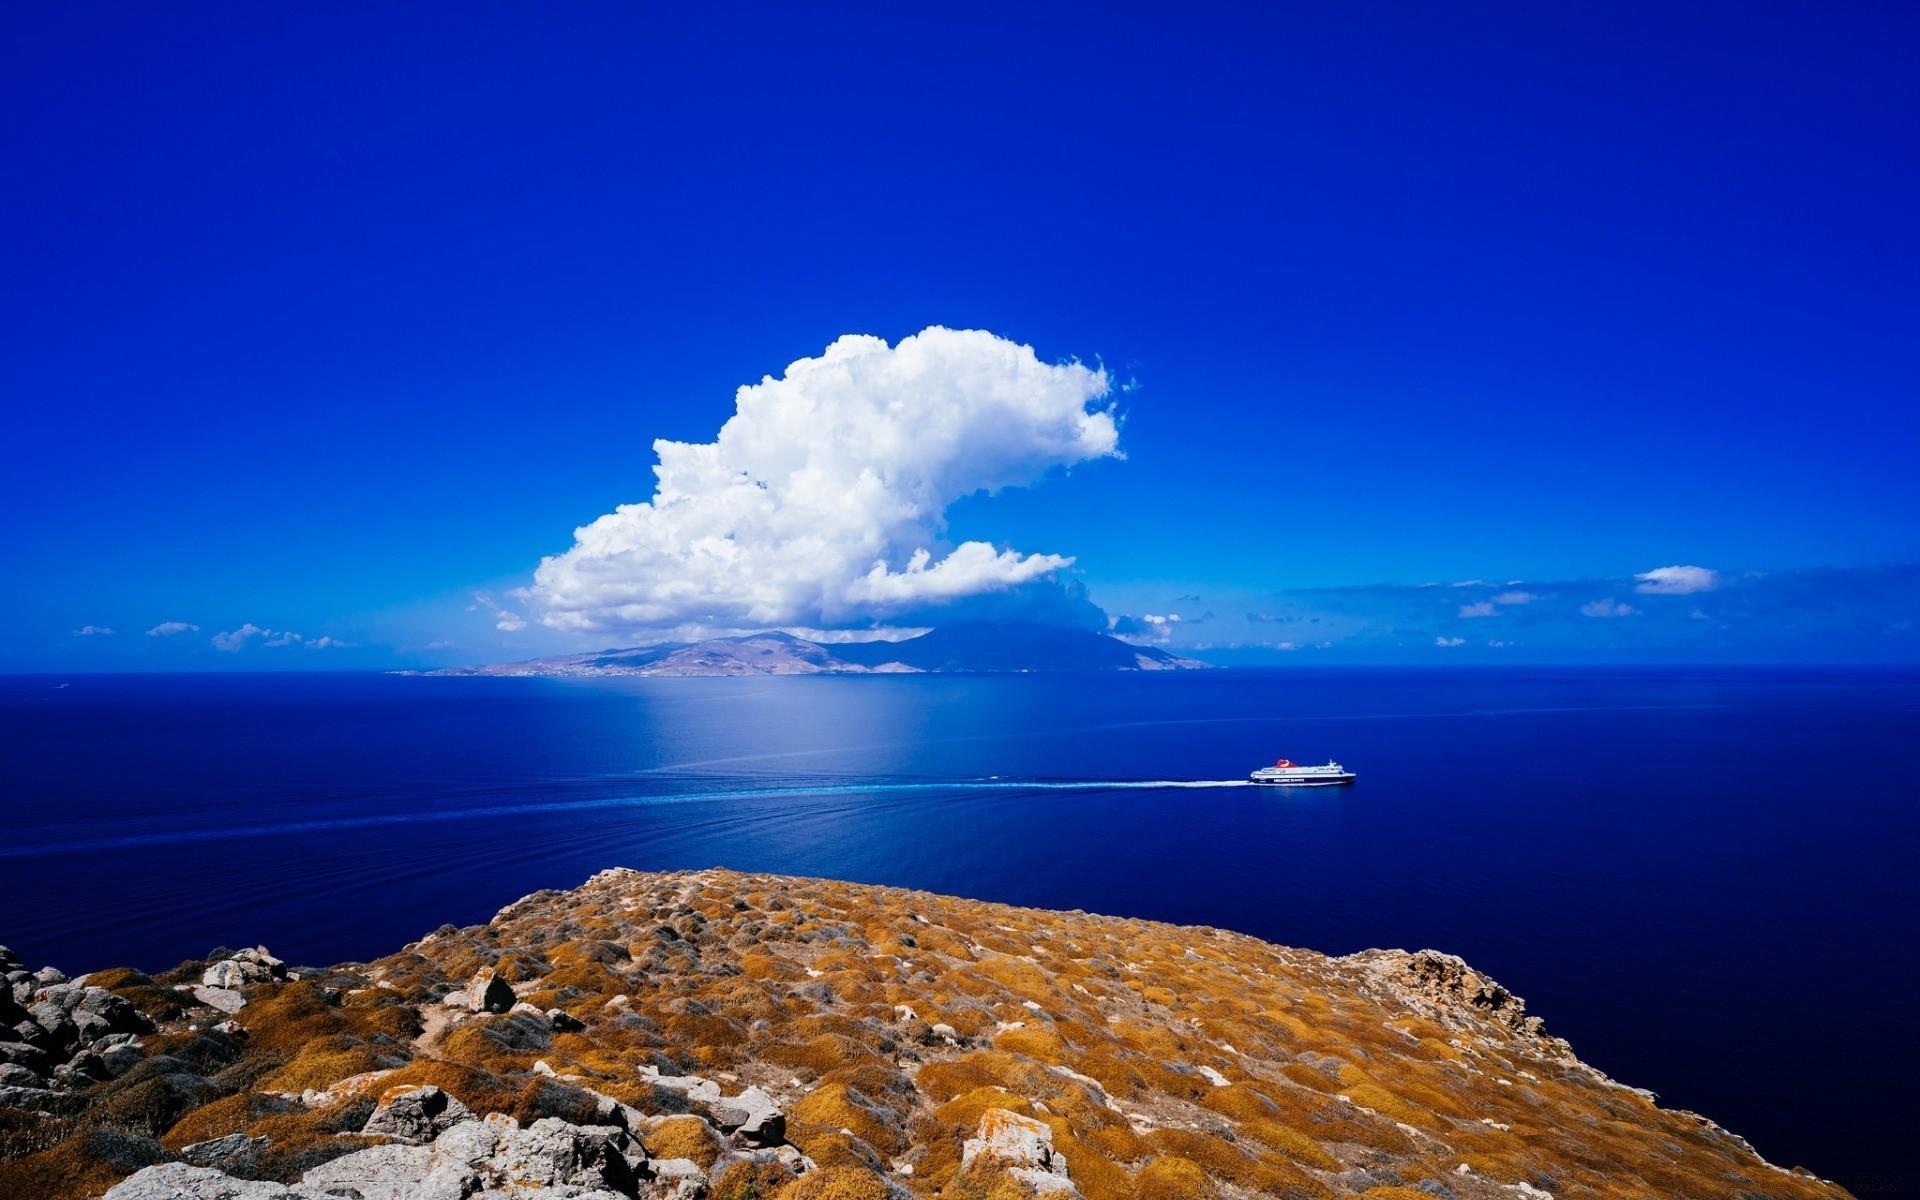 Europe Water Sea Travel Ocean Sky Seashore Landscape - Aegean Sea Wallpaper Hd - HD Wallpaper